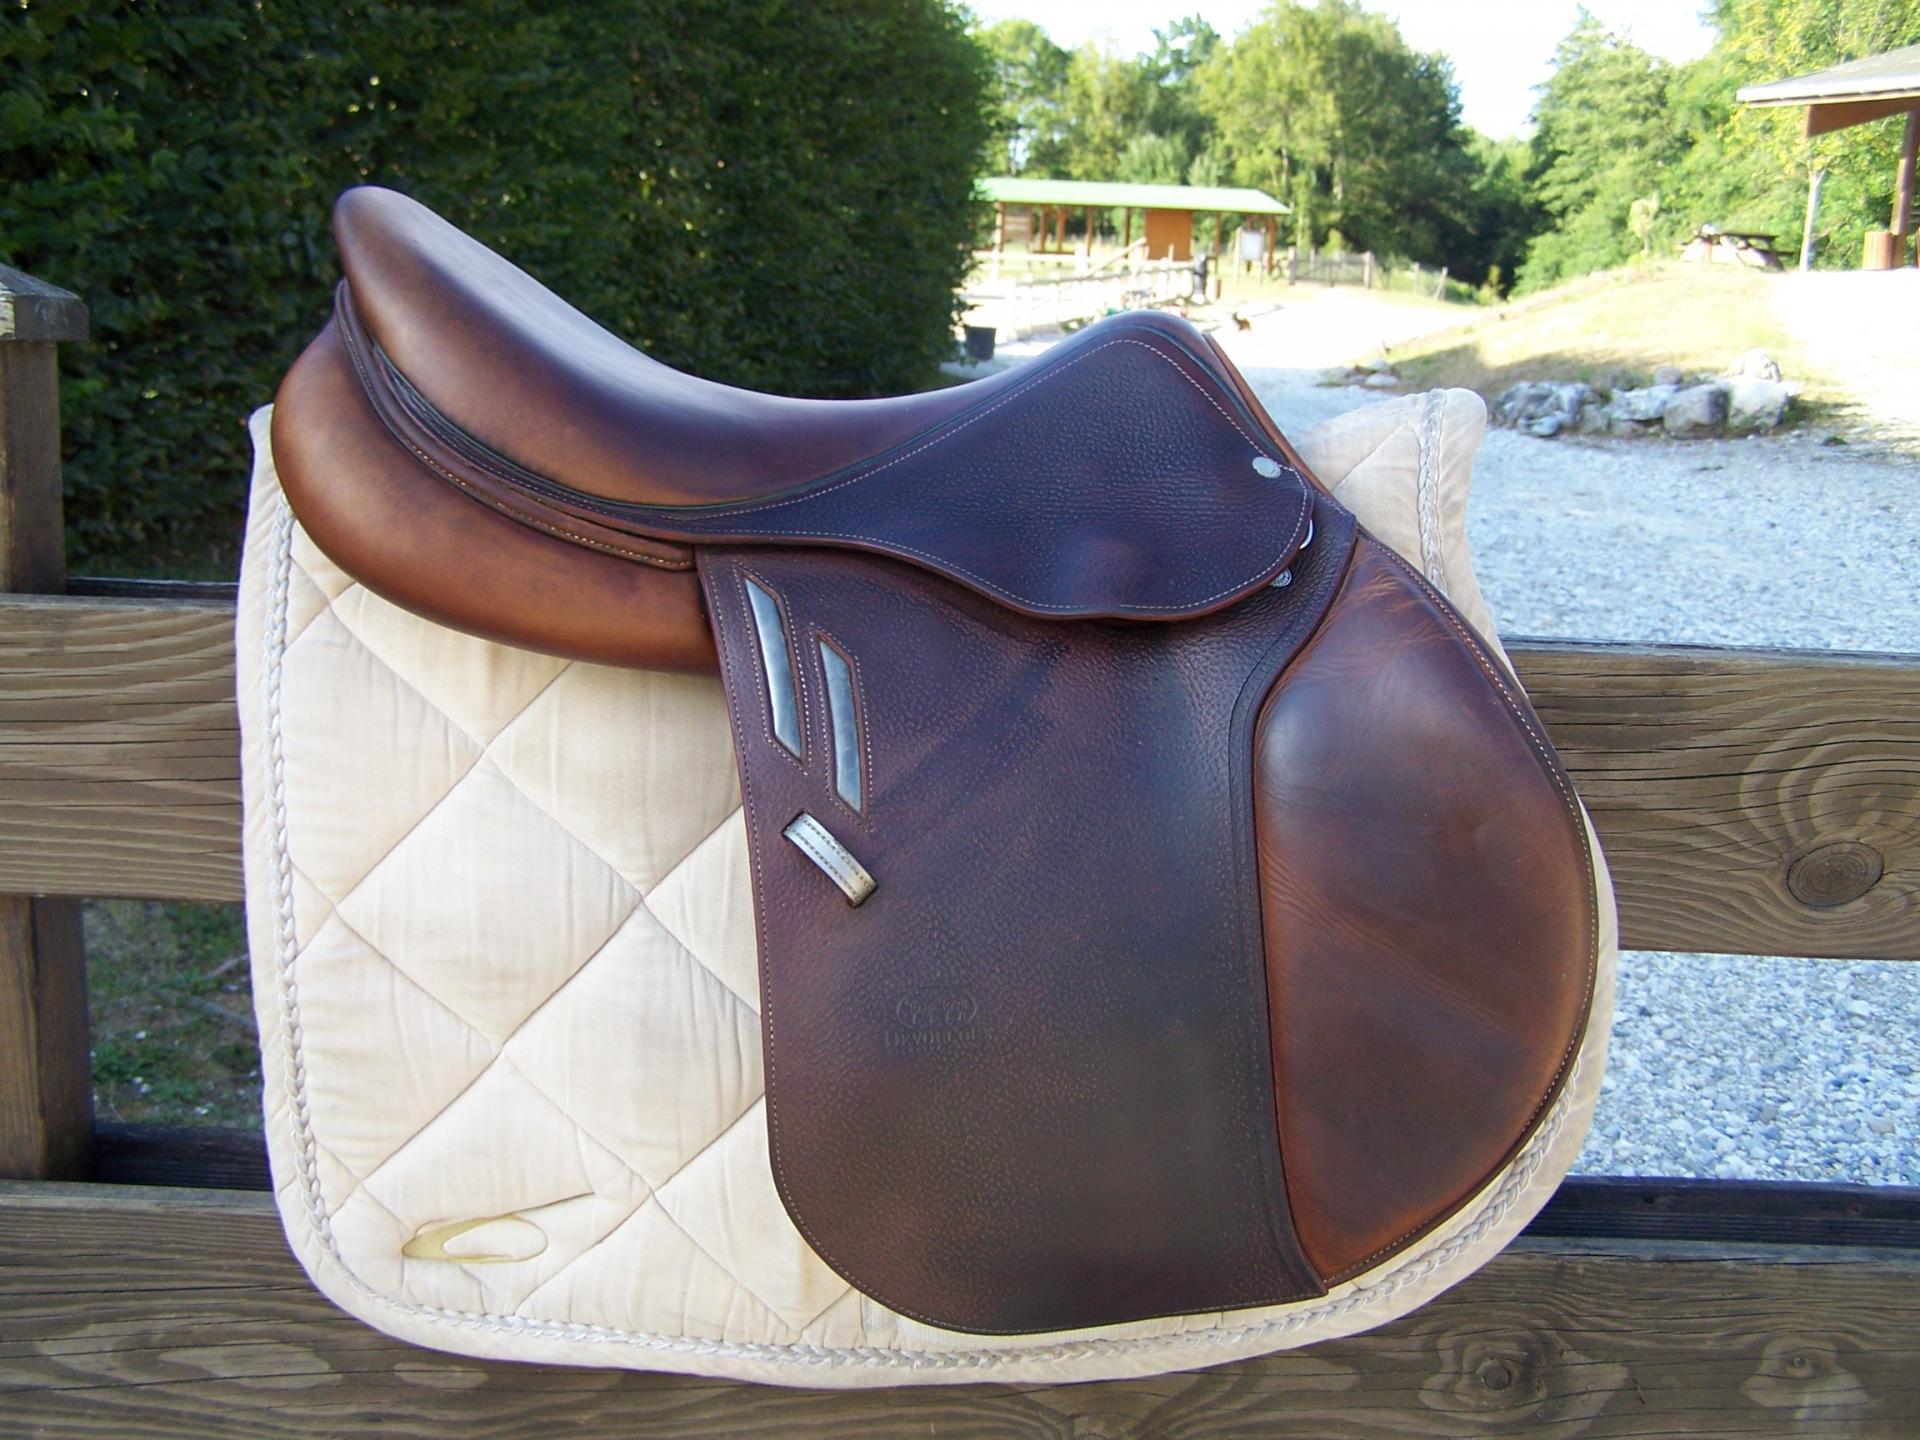 selles vendre ou louer avalaible saddle. Black Bedroom Furniture Sets. Home Design Ideas